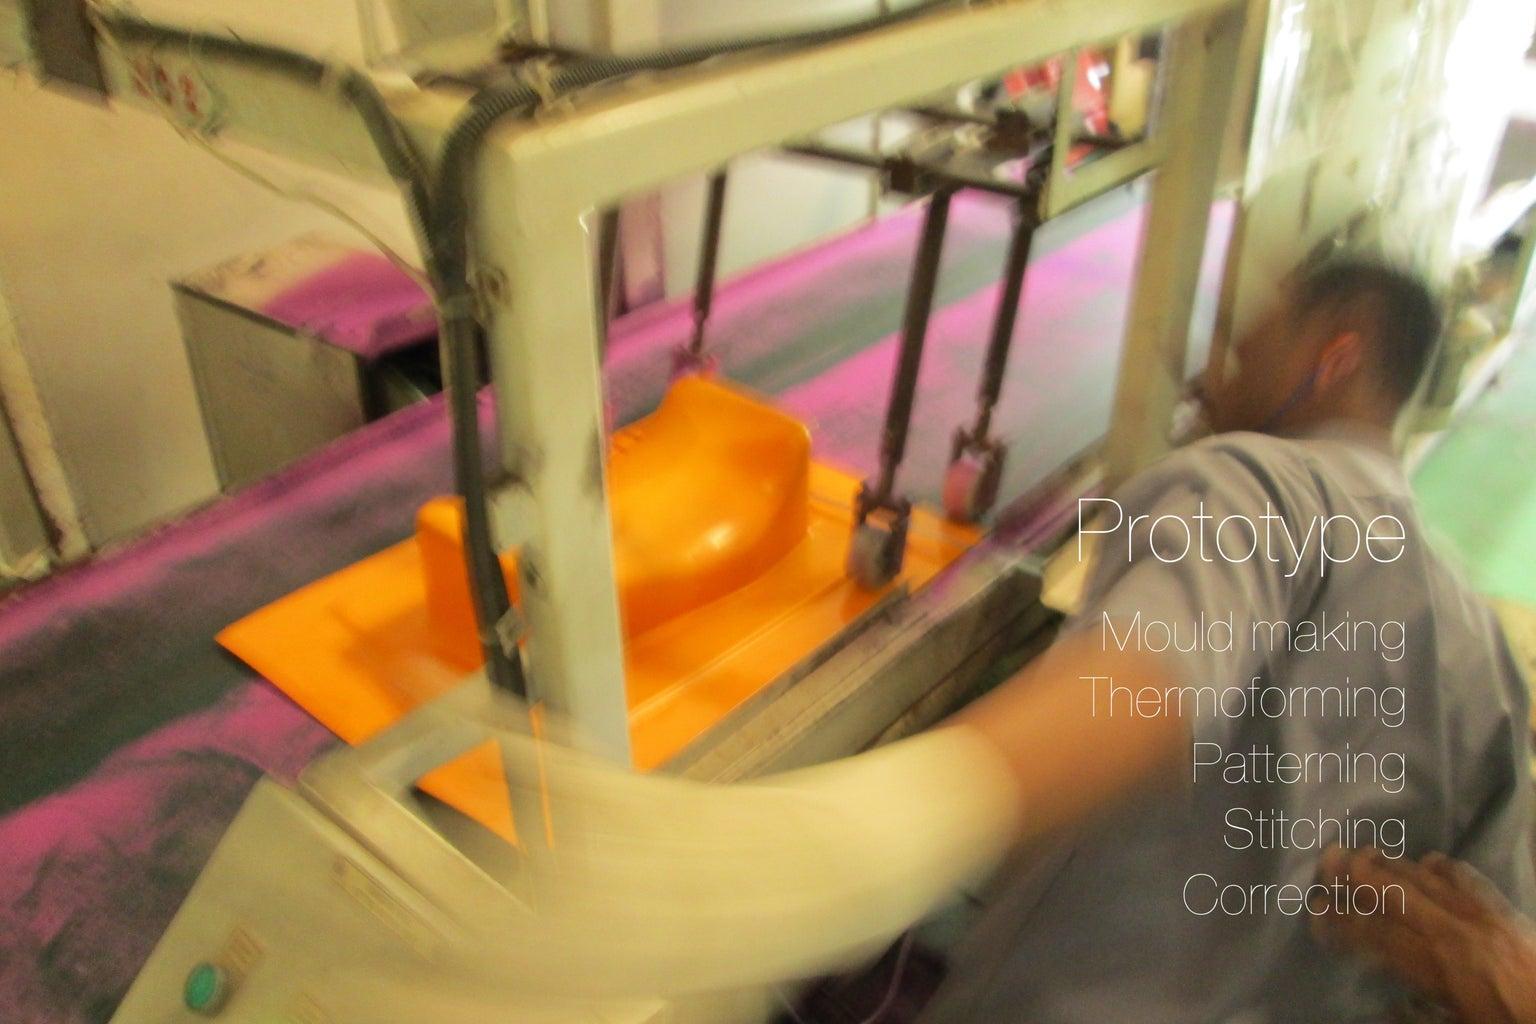 Make It: Vacuum Forming